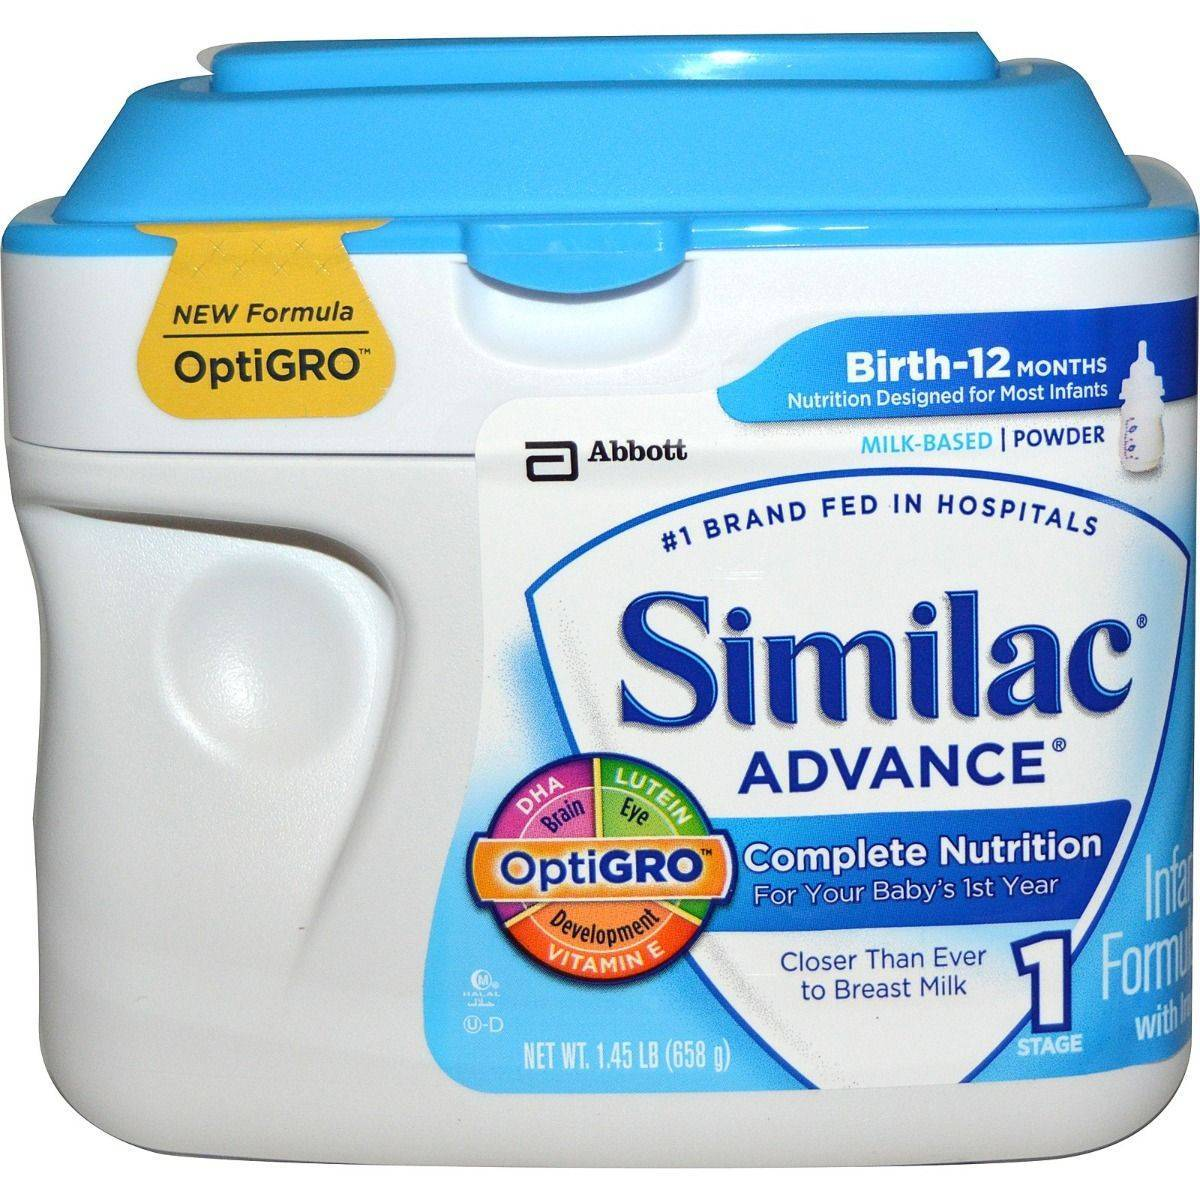 Similac Early Shield Advance Formula 658g